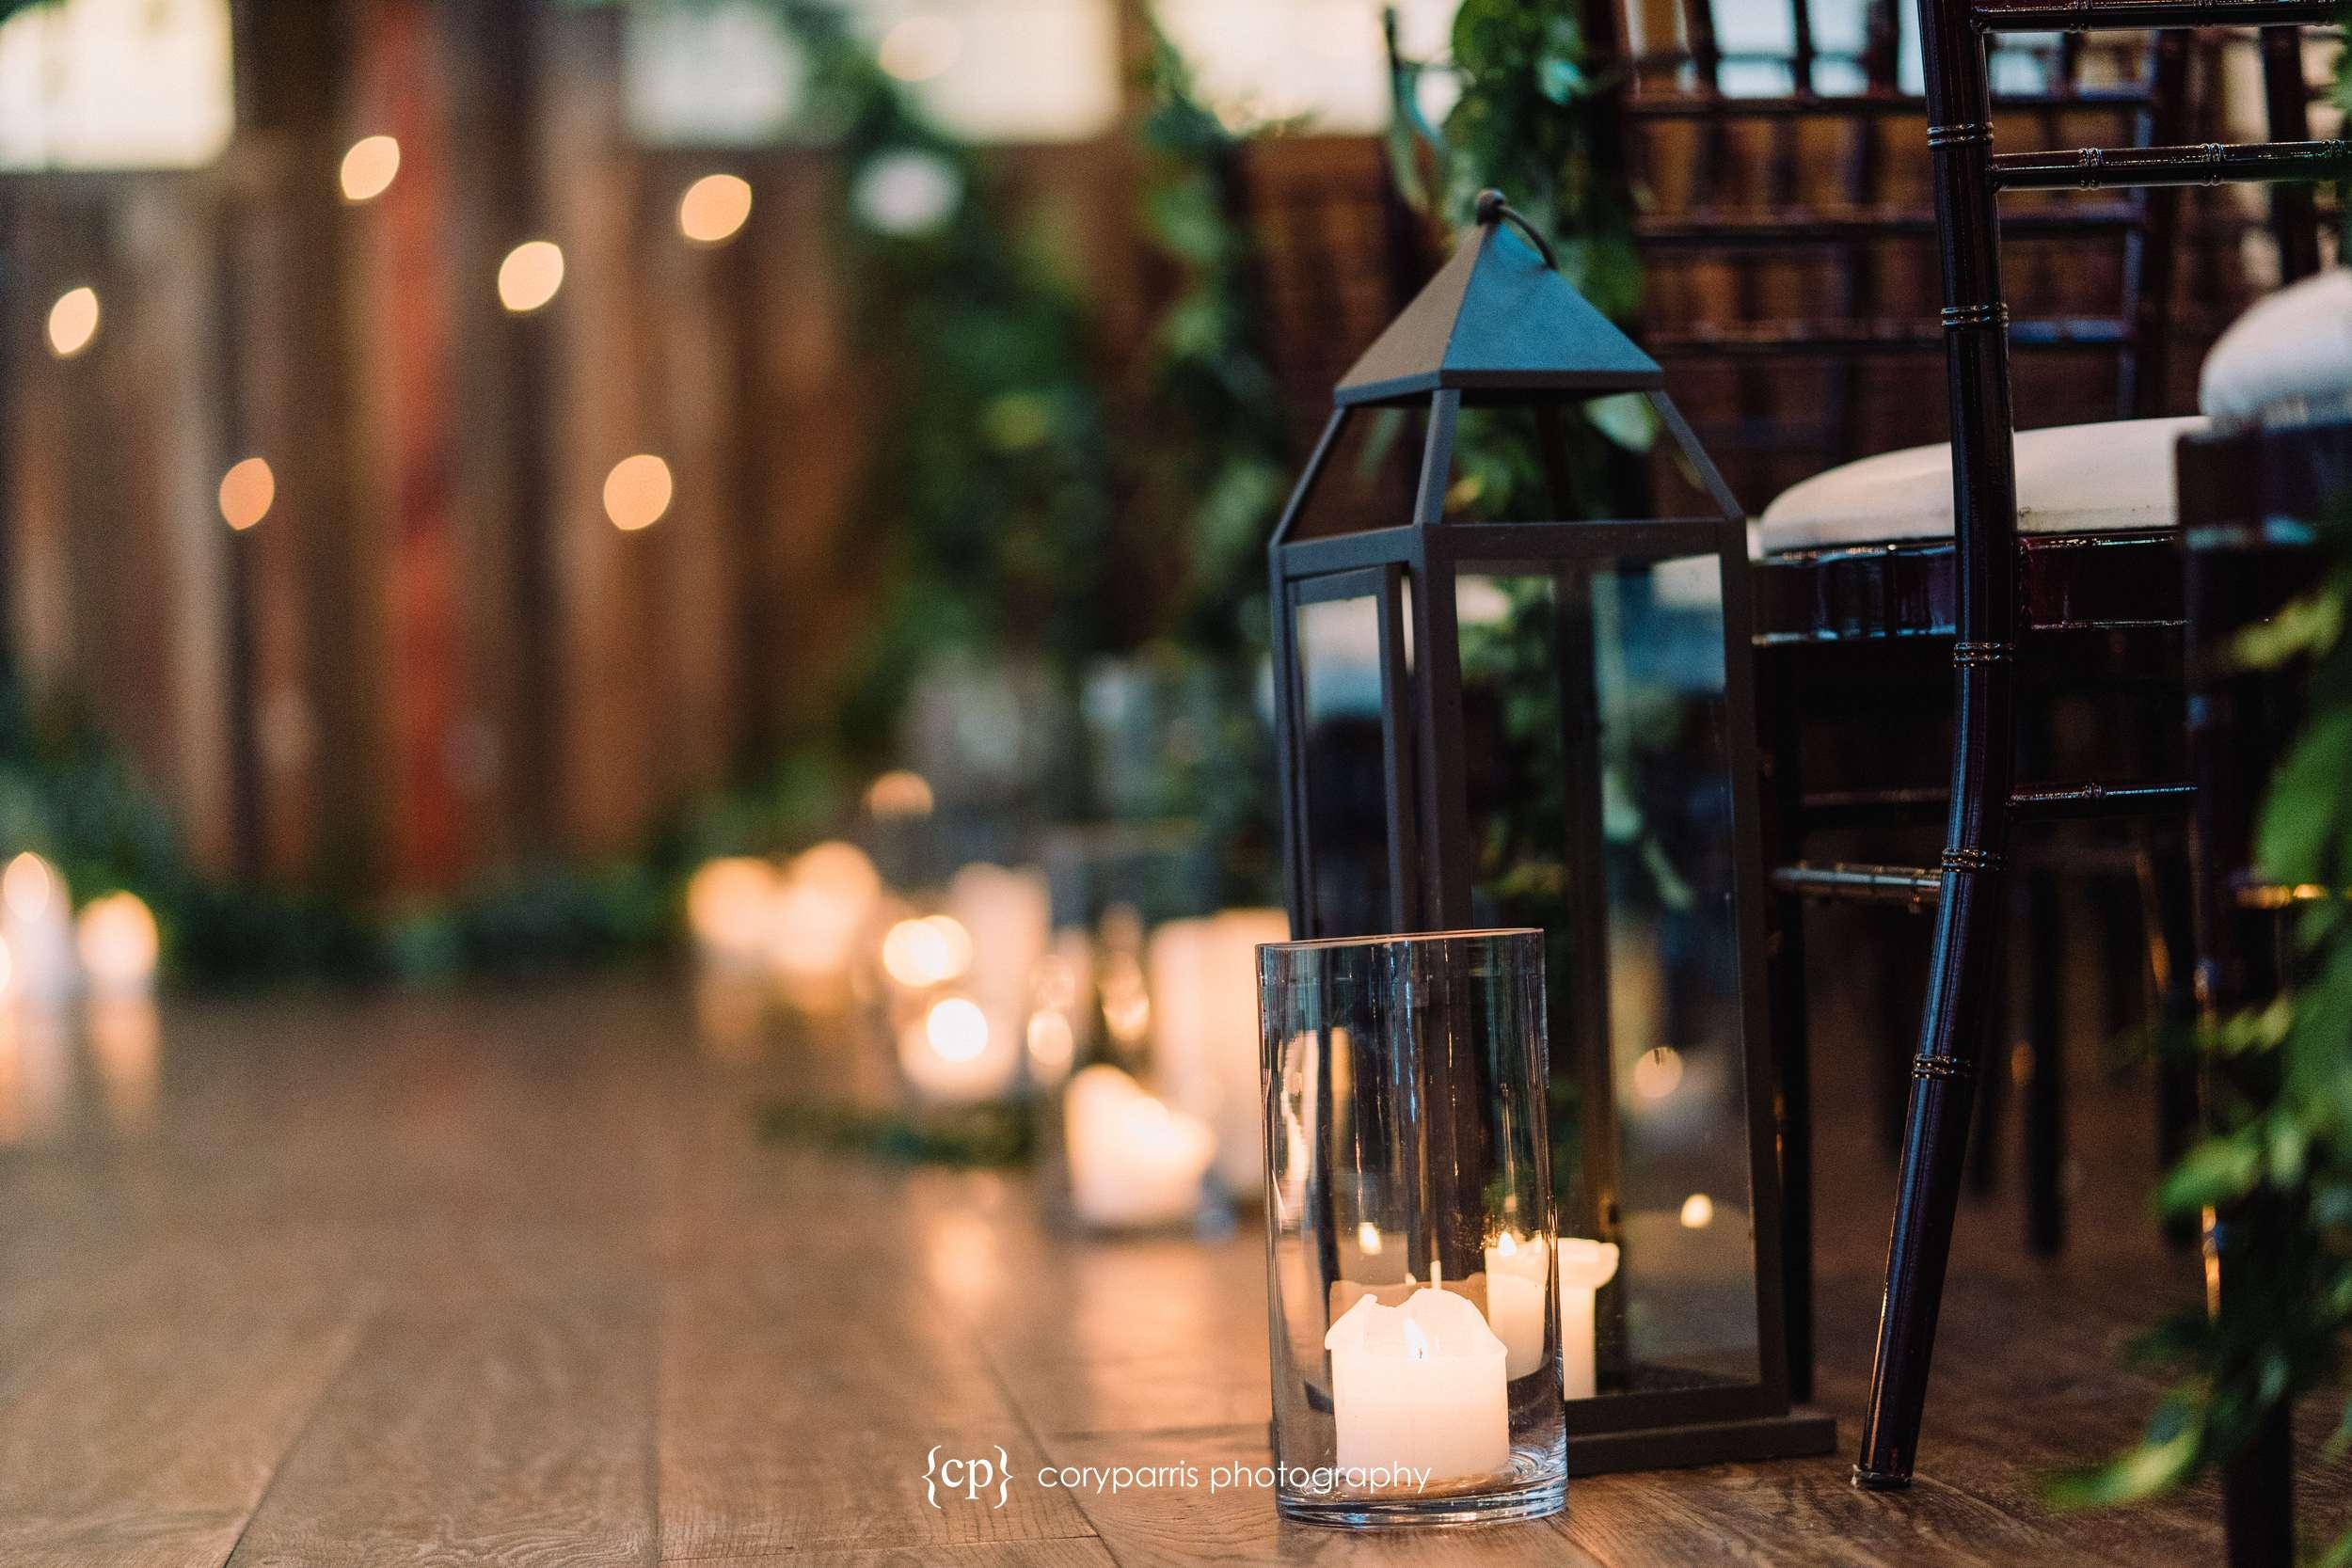 035-SODO-Park-wedding-venue-seattle.jpg